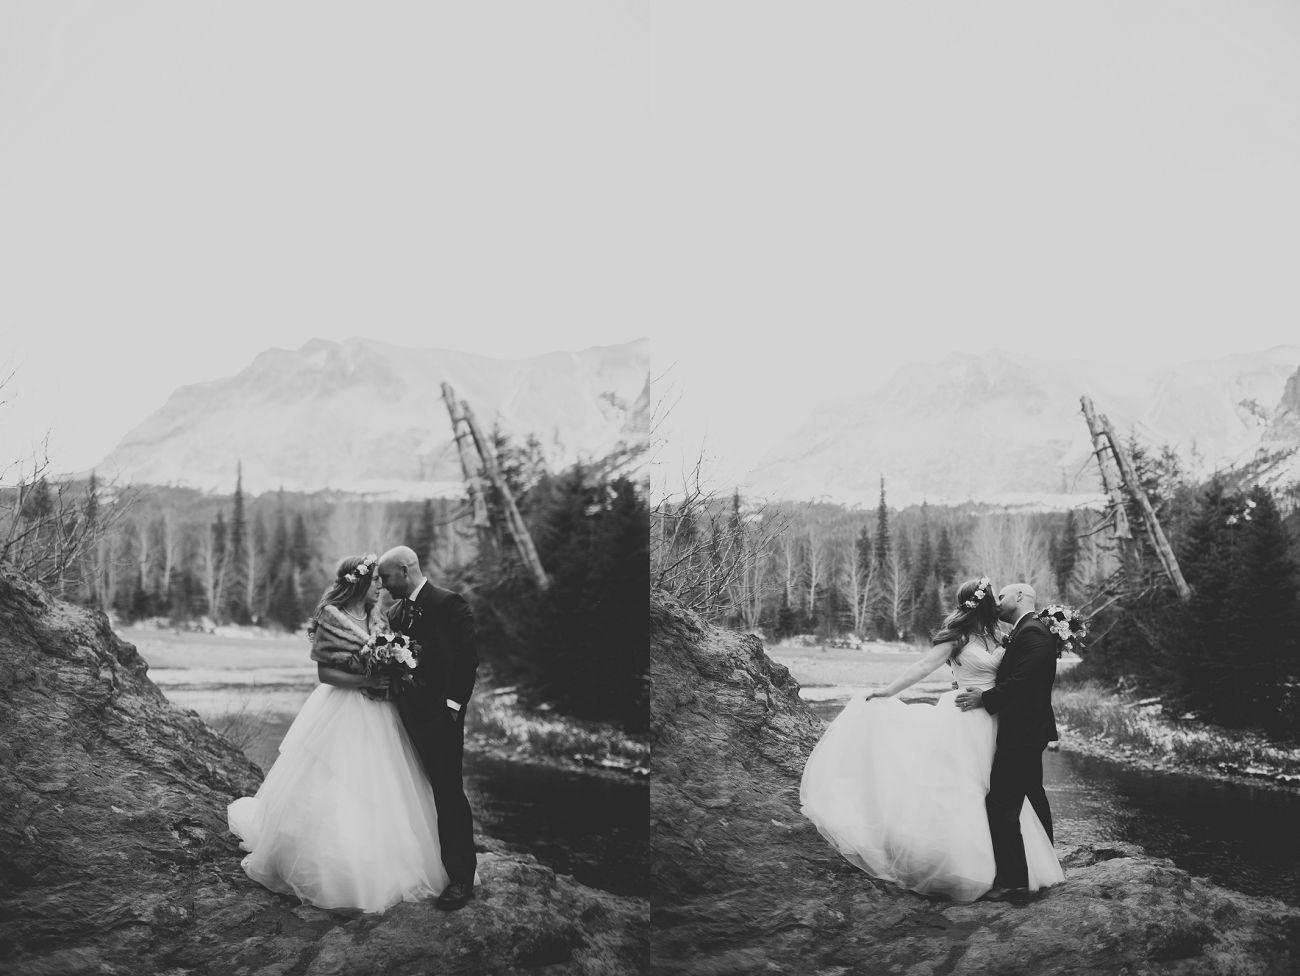 Jennifer_Mooney_Photo_Whitefish_mountain_resort_wedding_elegant_montana_wedding_064.jpg